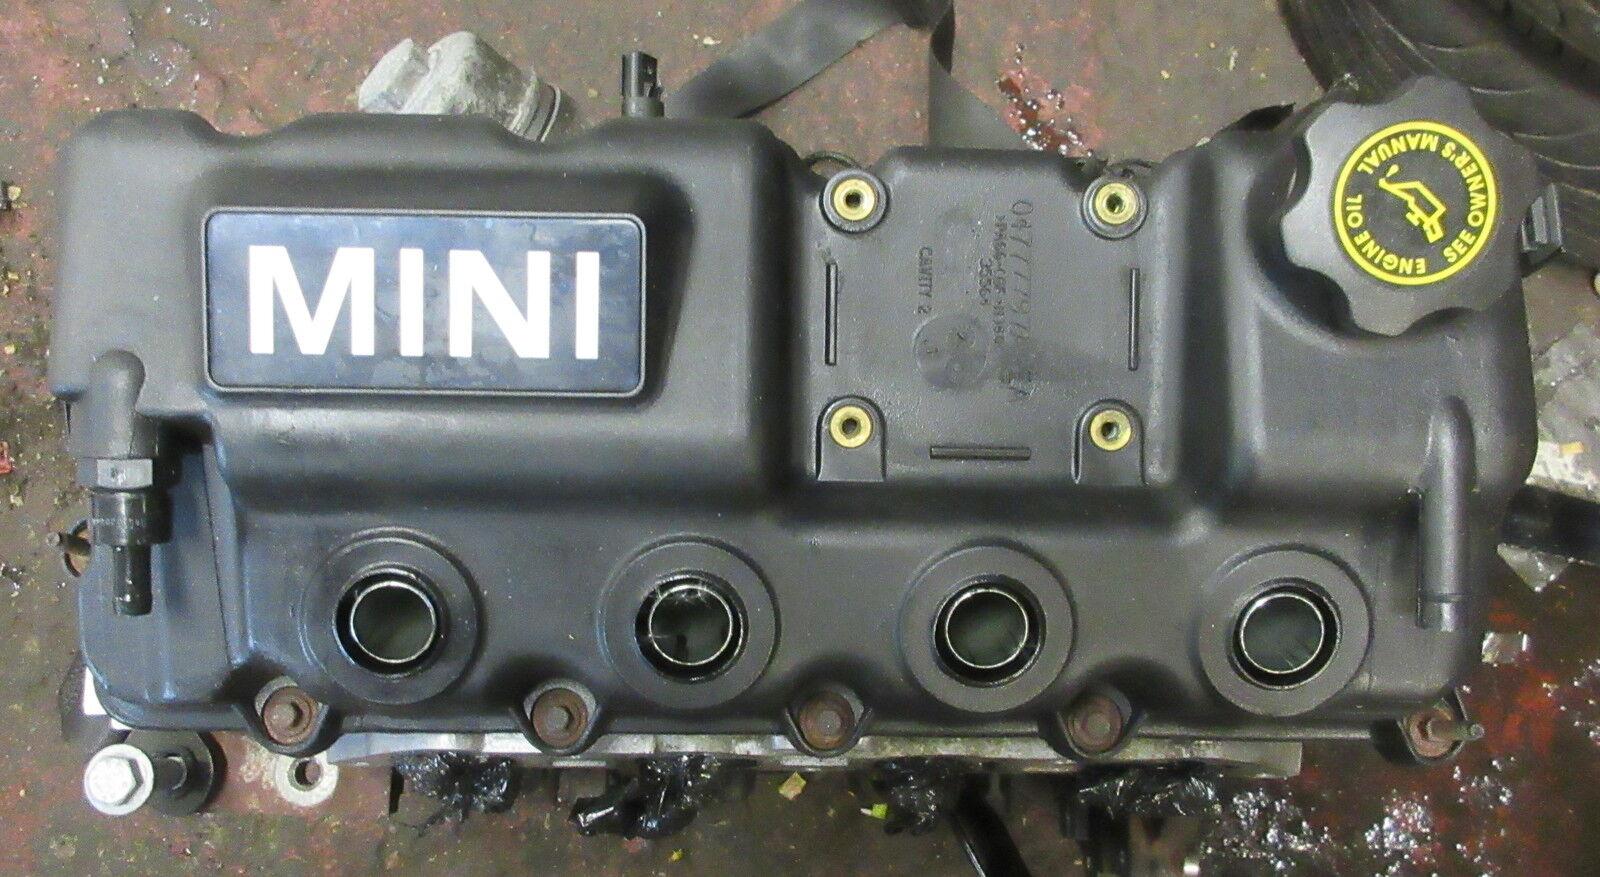 MINI Used R50 R52 (Cooper & One) Petrol Engine  W10 B16 1.6 (2000 - 2006) 62,000